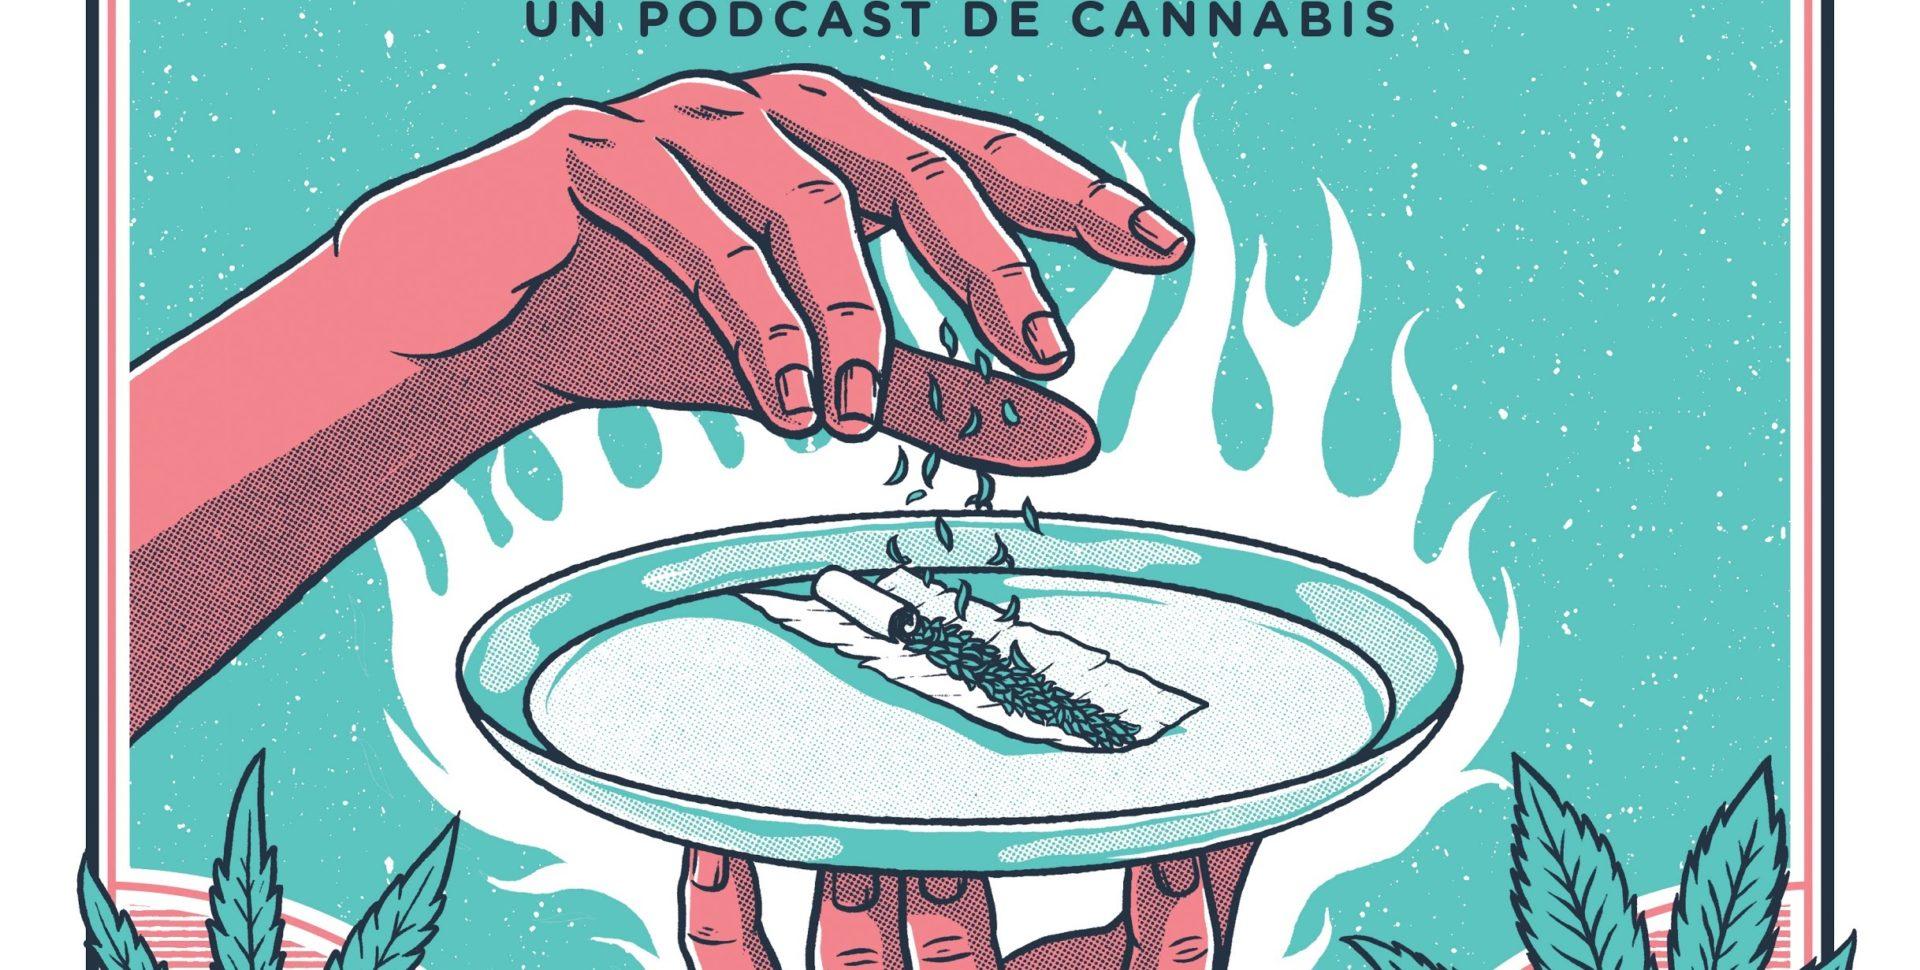 Porro Podcast